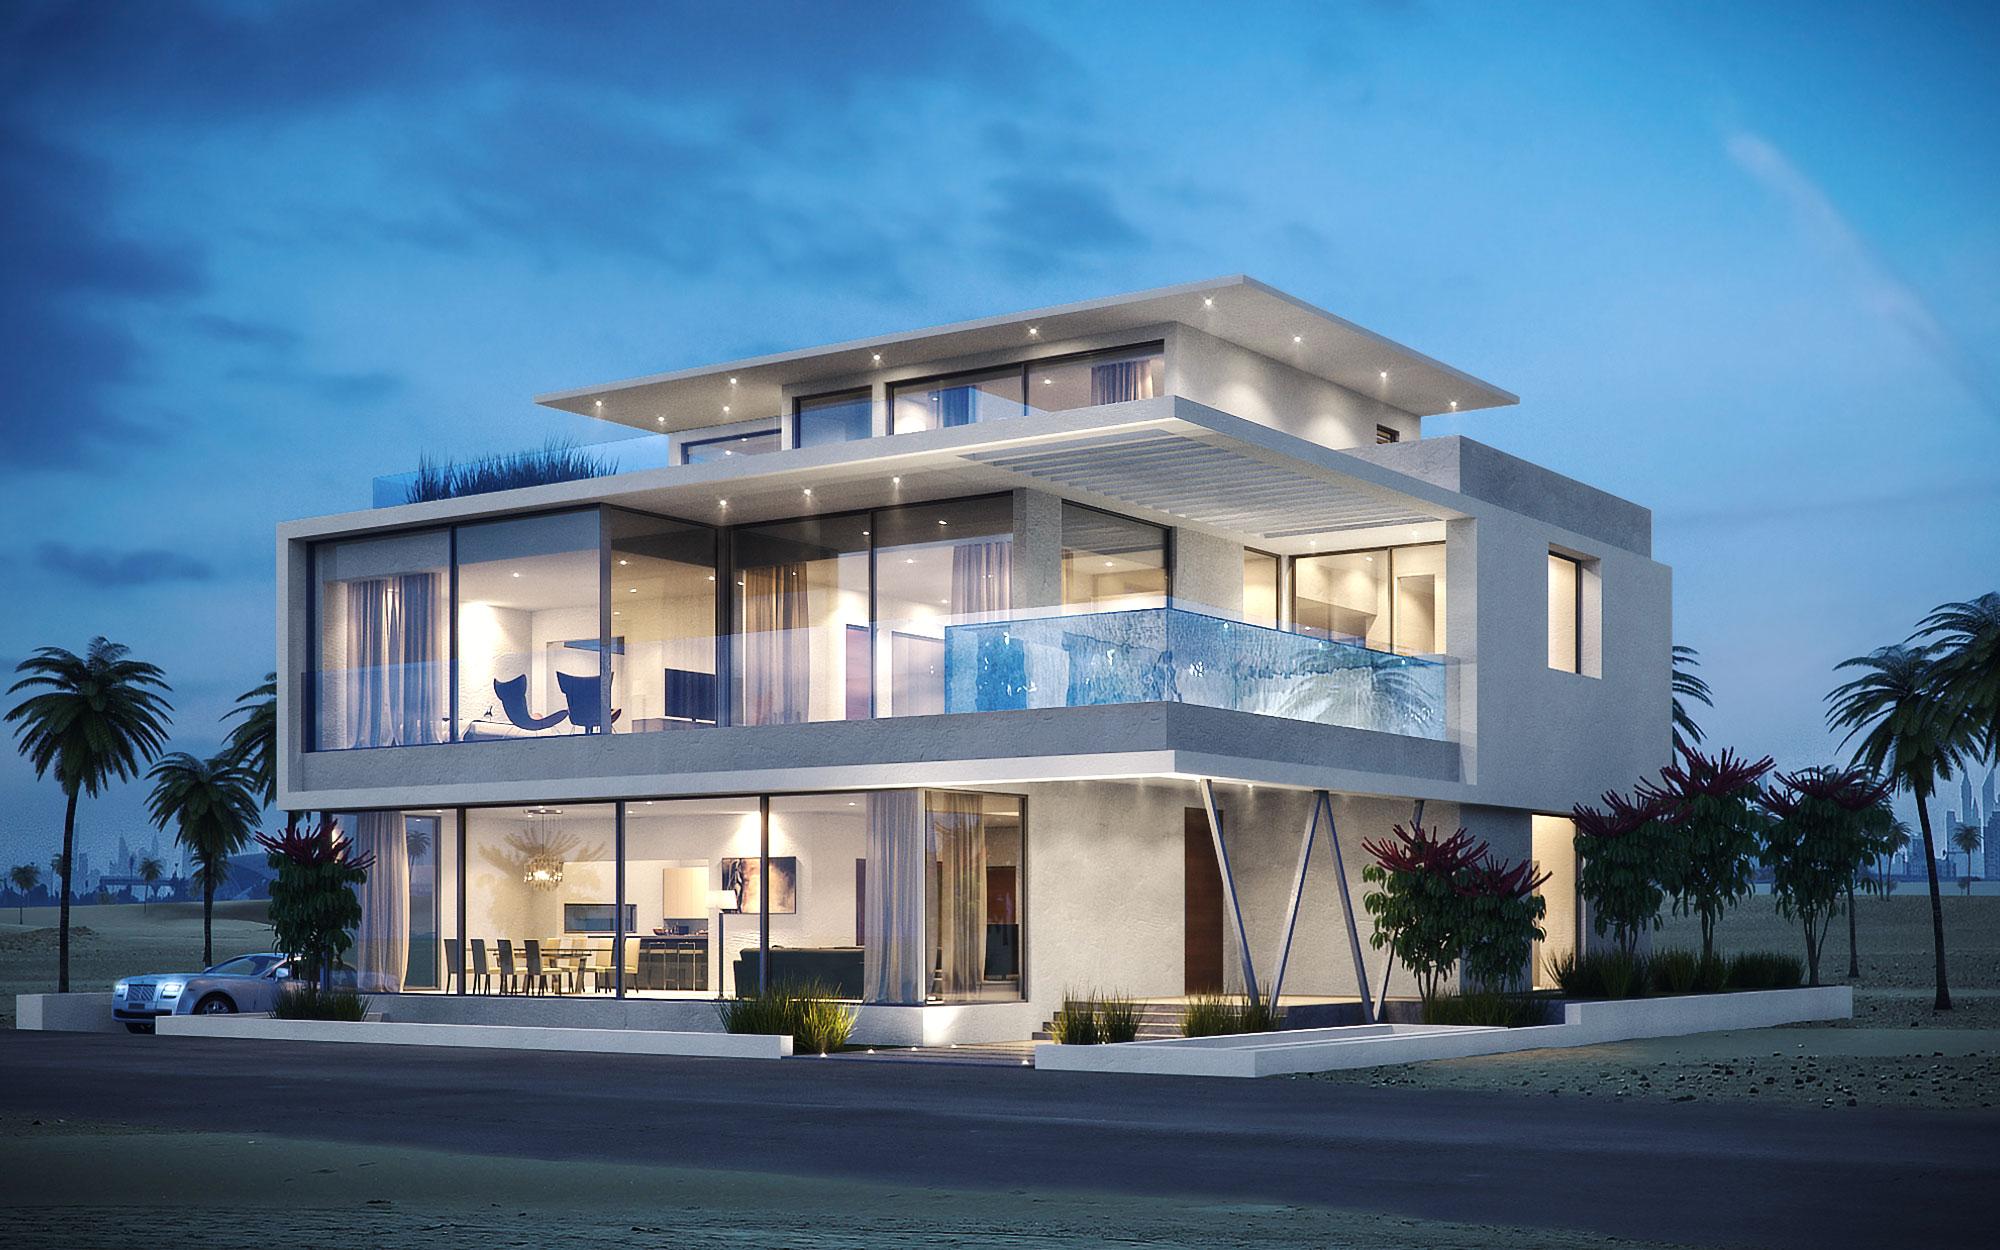 Umm Suqeim Beach Villa Architectural Concept Design